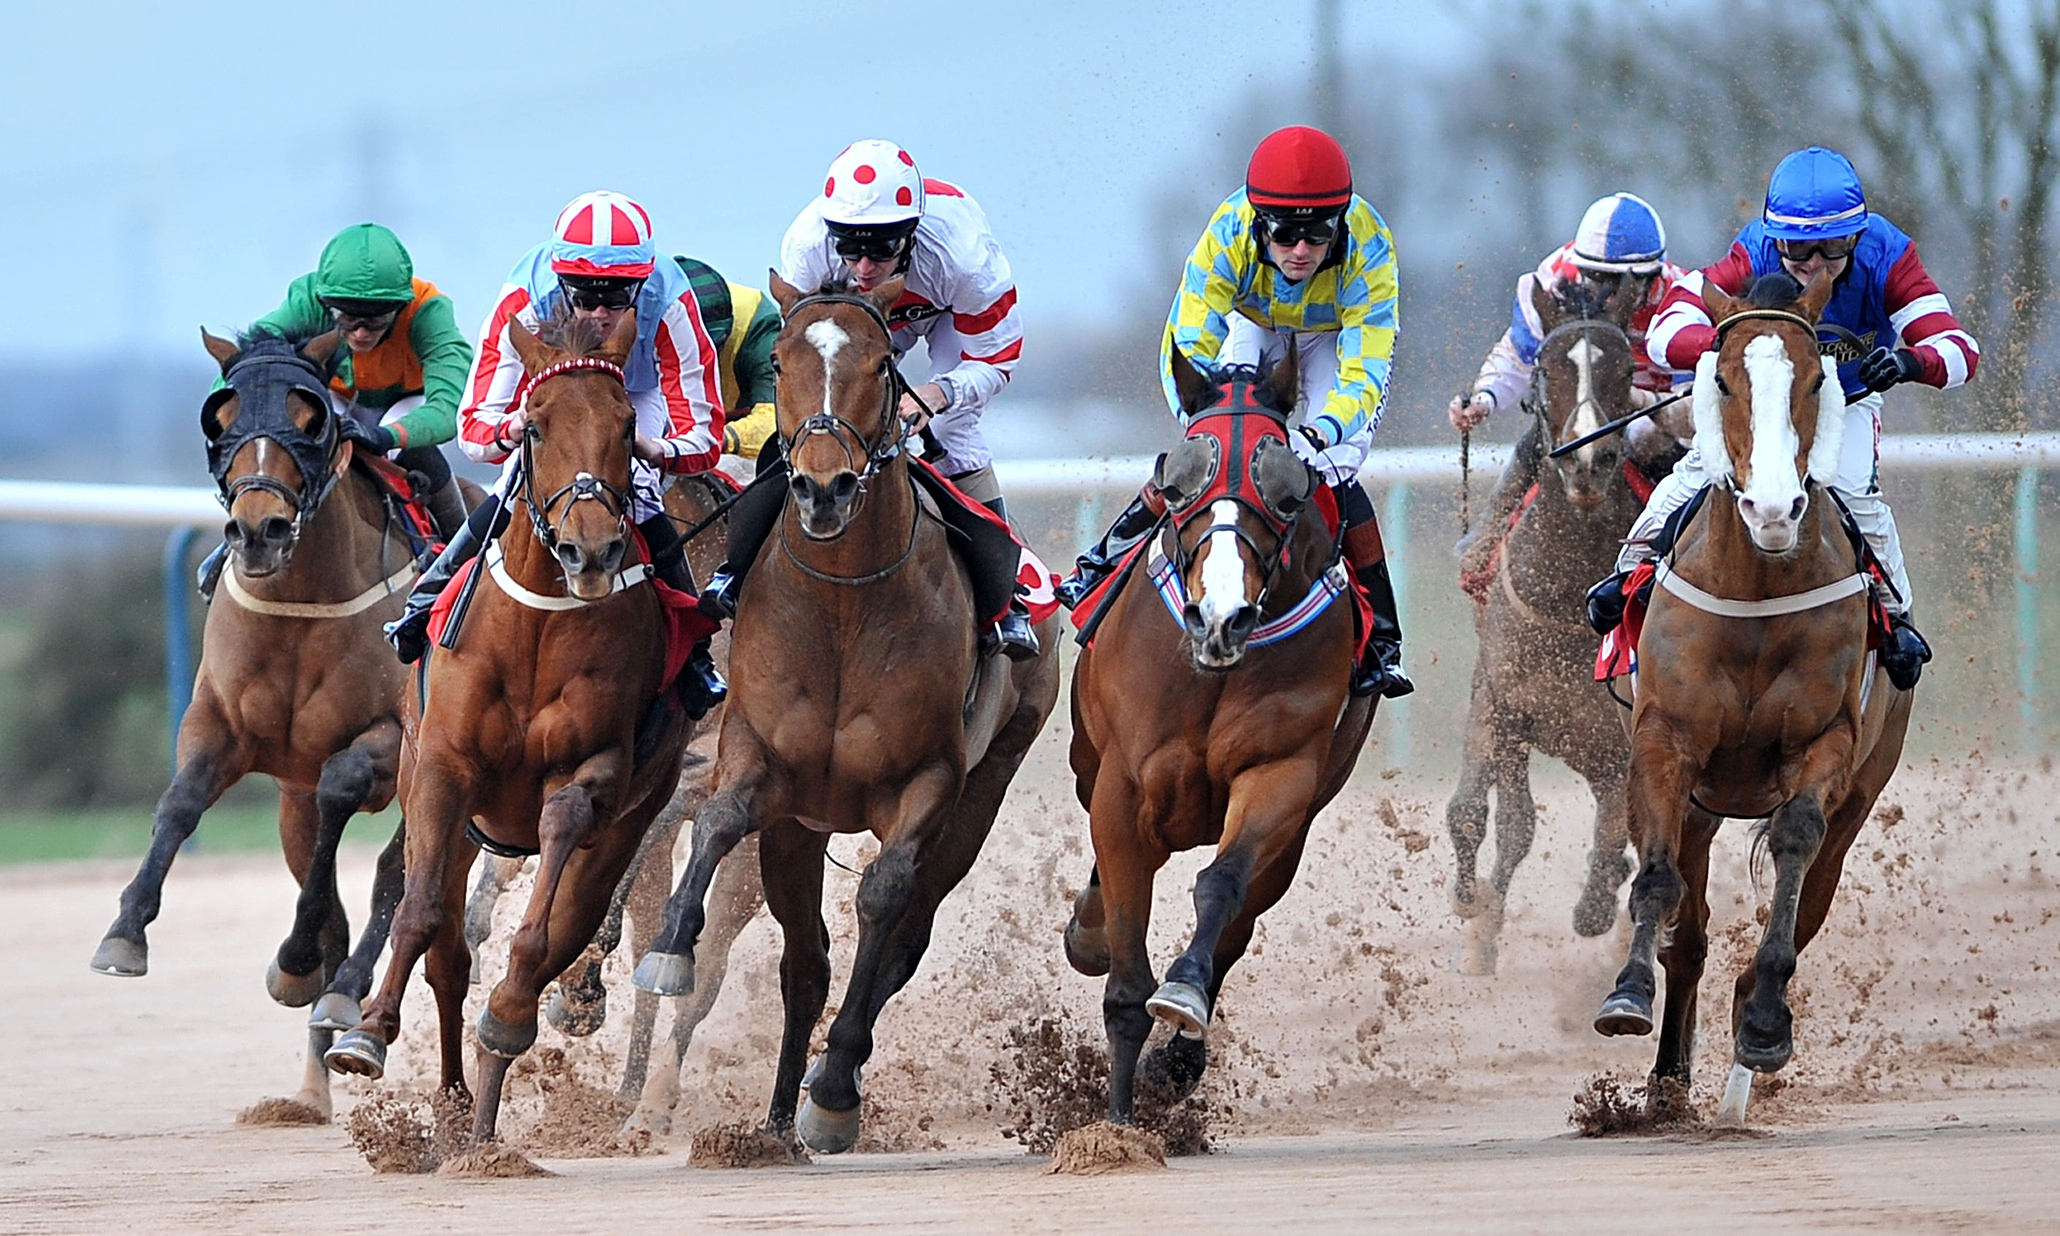 Phenne_SportHospitality_HorseRacing